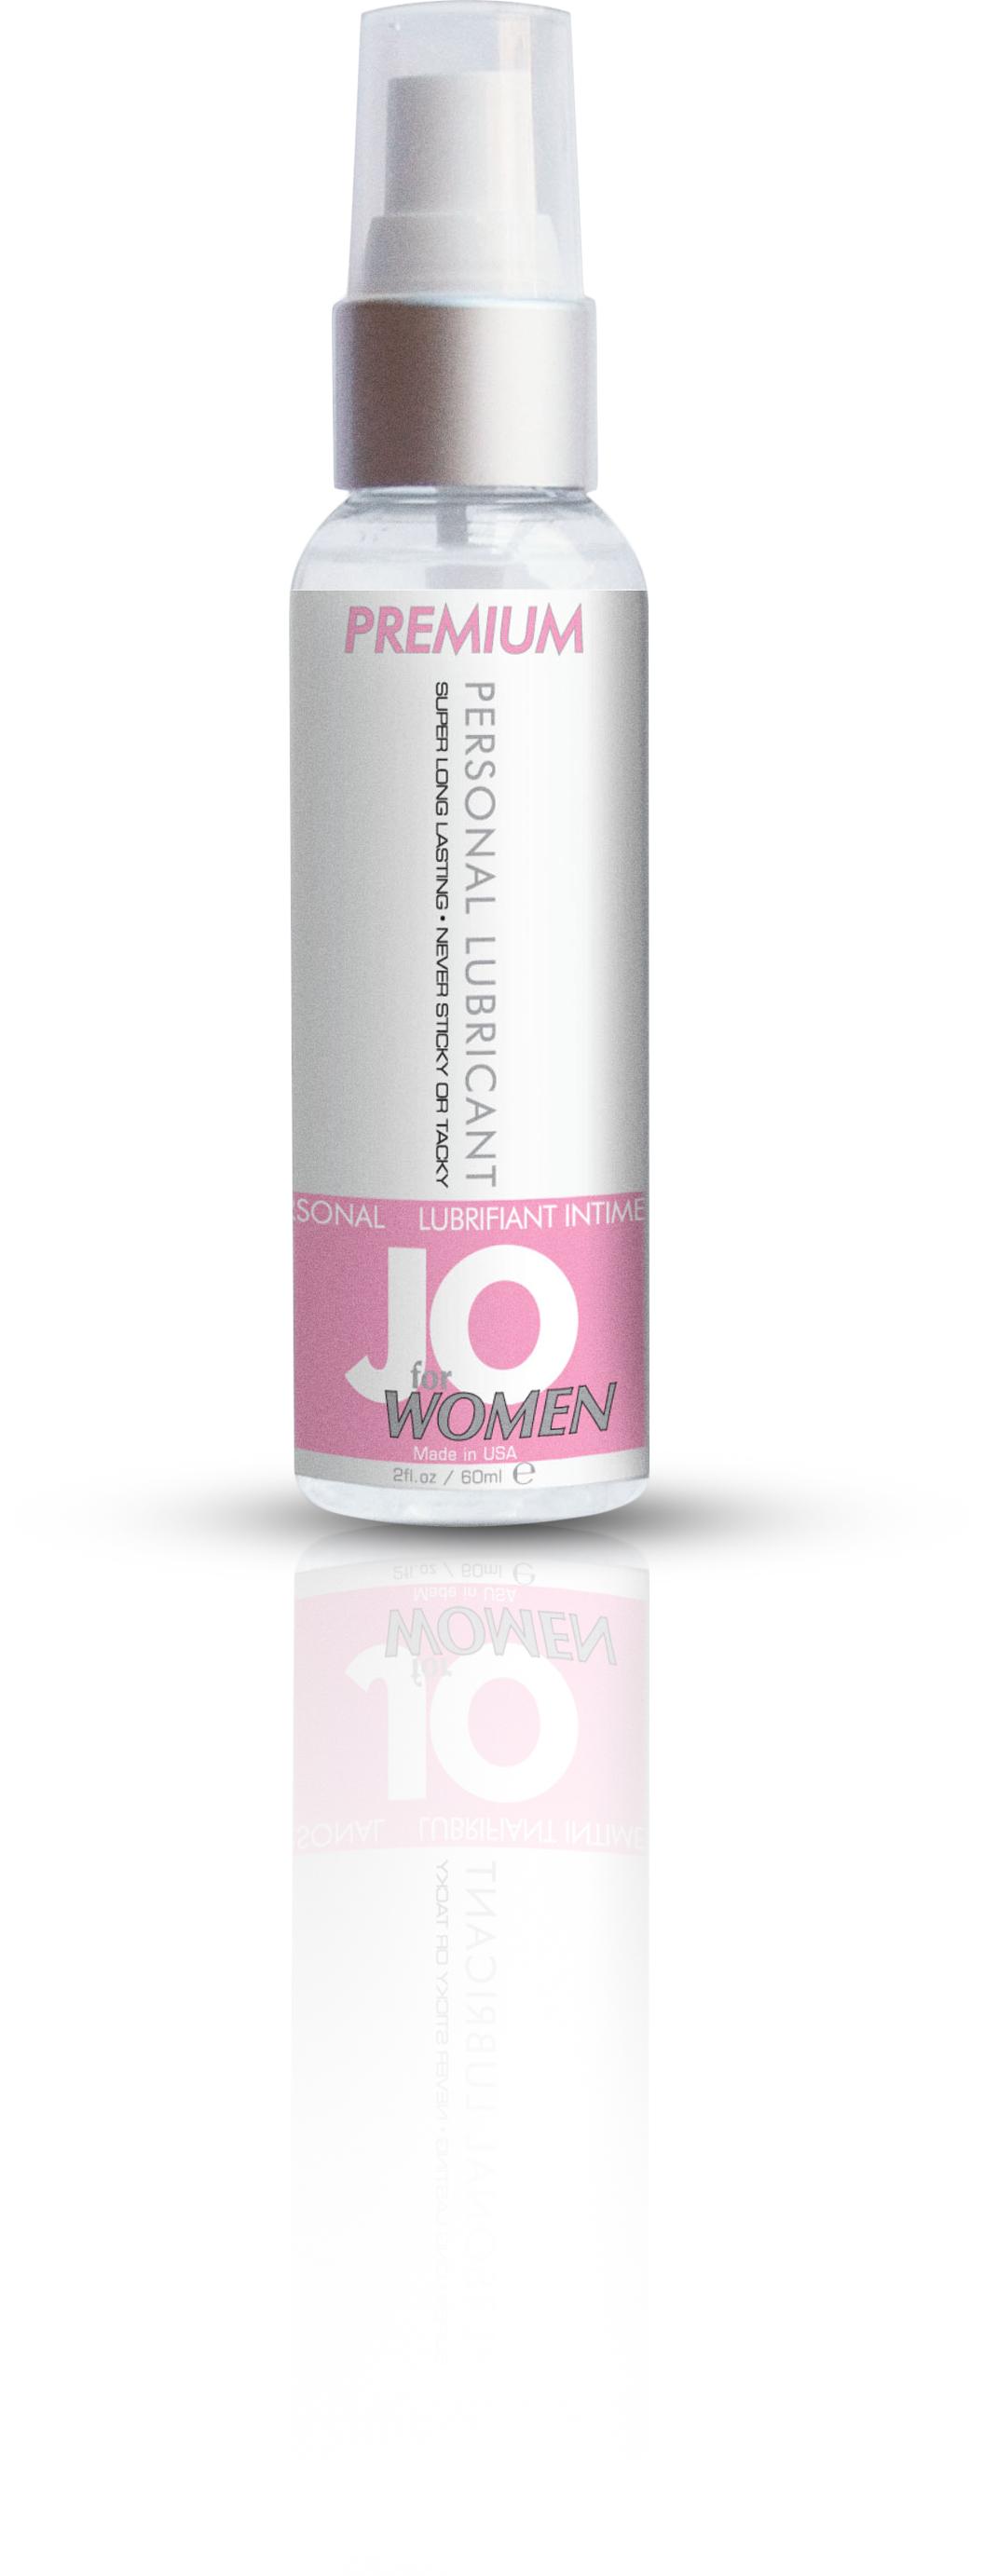 40065_JO_for_women_premium_lube_original_2oz.jpg